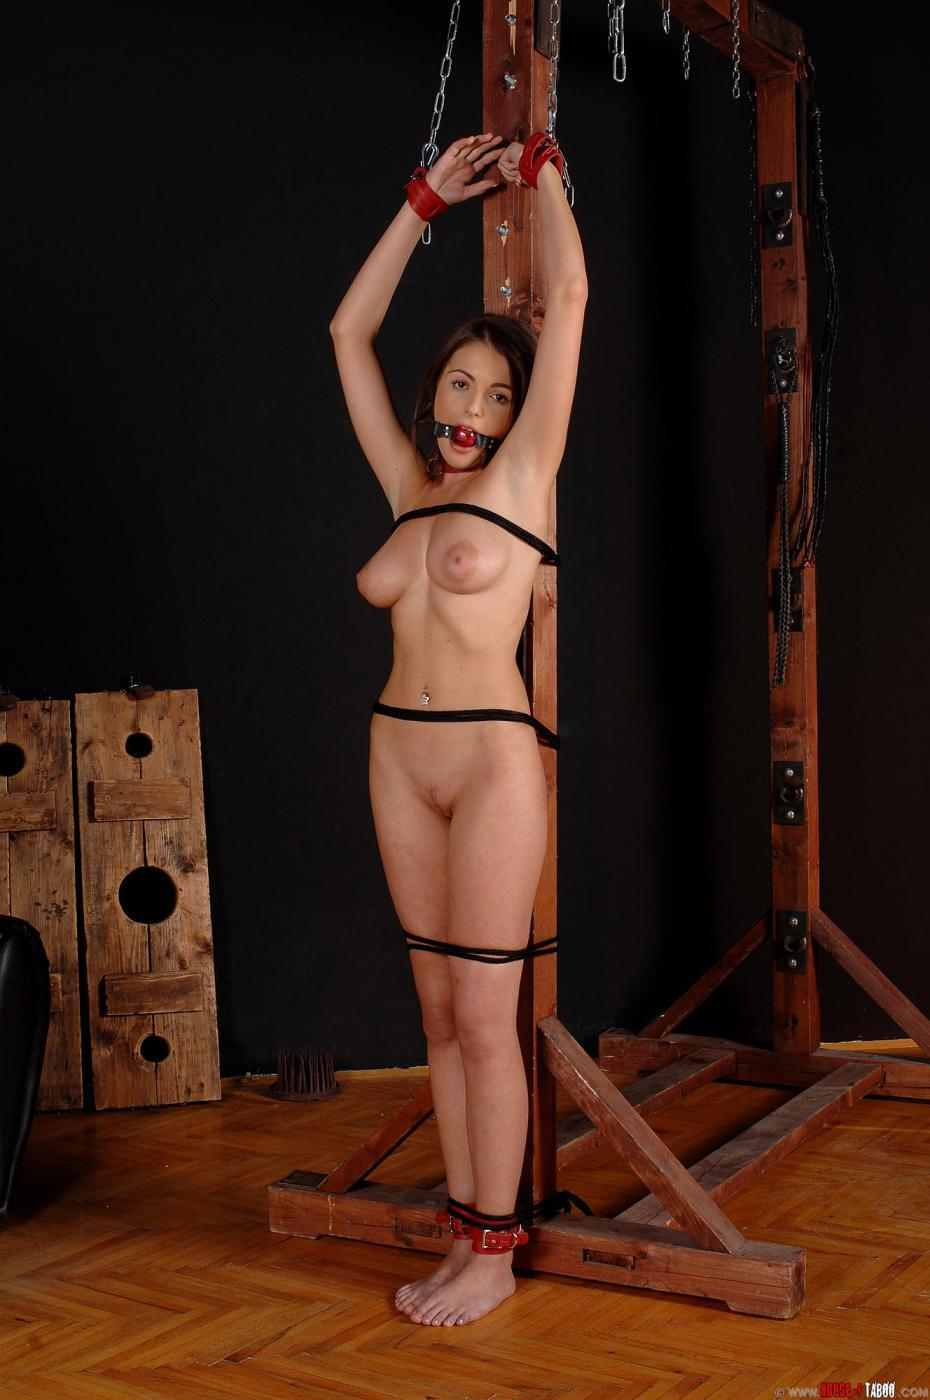 Laura orsolya bondage